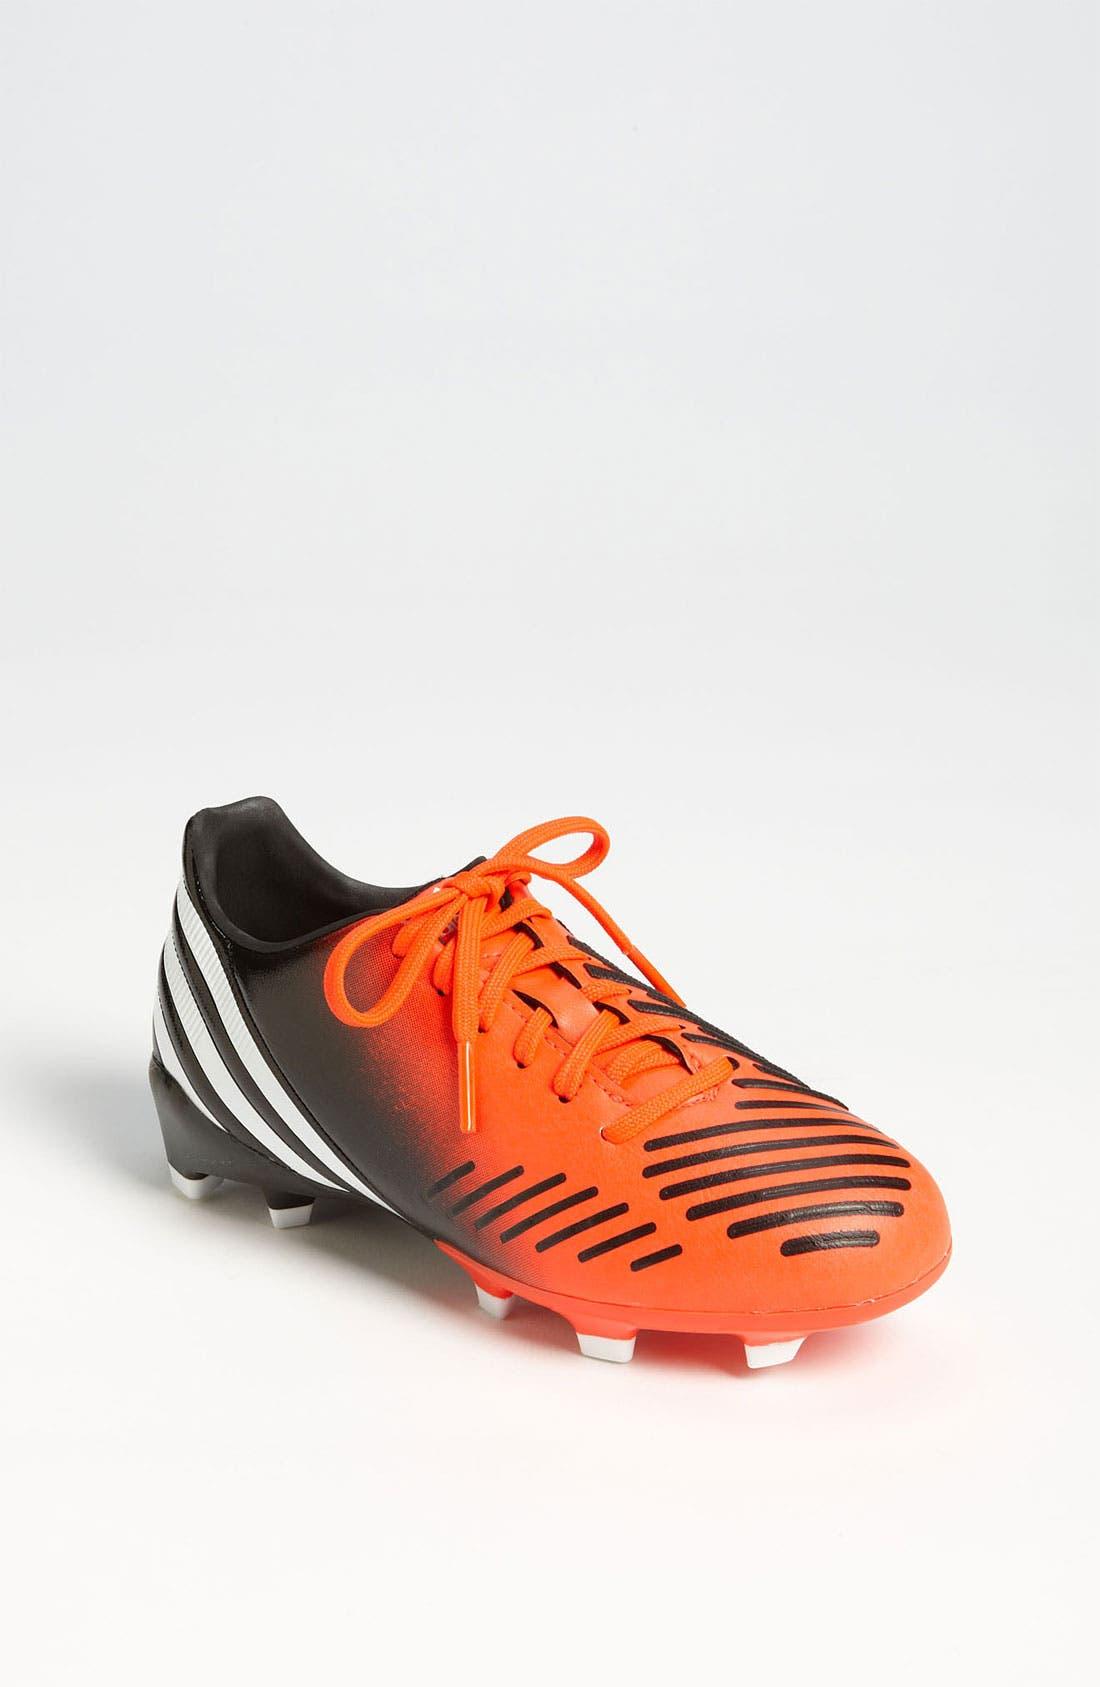 Main Image - adidas 'Predator Absolado LX TRX FG' Soccer Cleats (Toddler, Little Kid & Big Kid)